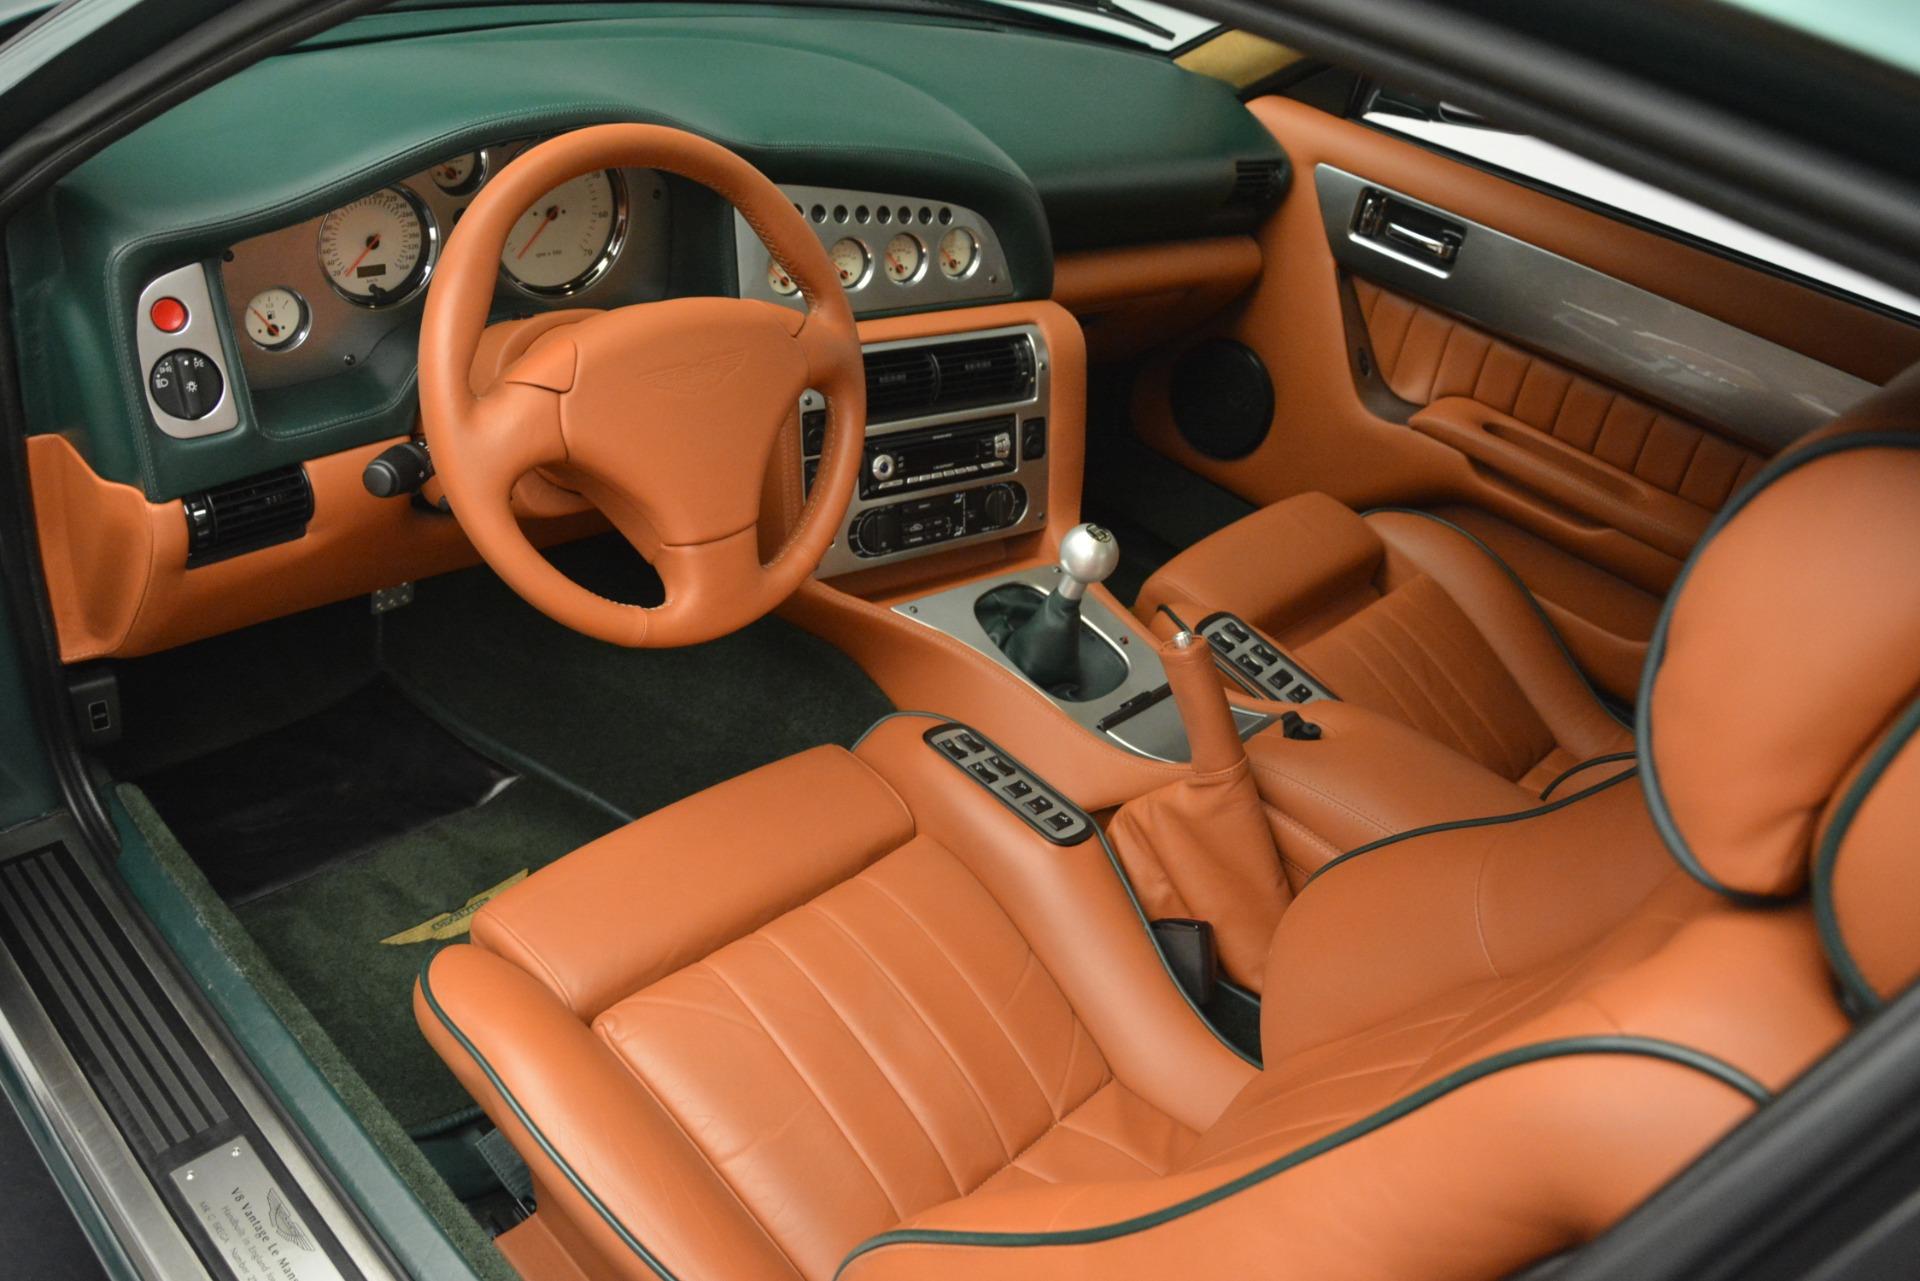 Used 1999 Aston Martin V8 Vantage Le Mans V600 Coupe For Sale In Westport, CT 2789_p15